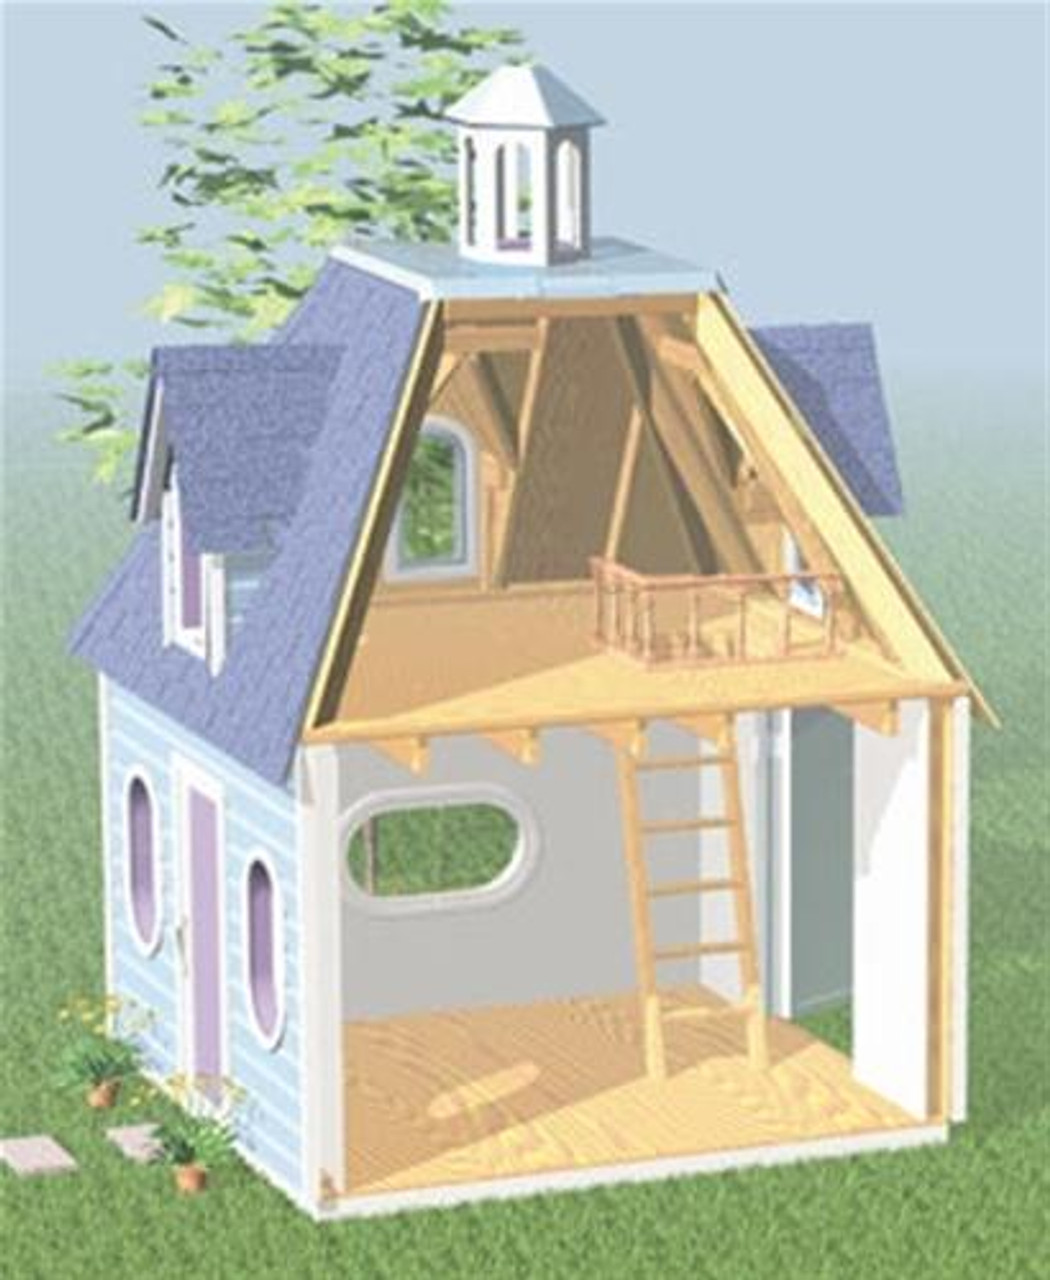 Cherry Tree Toys Lighthouse Playhouse Plan